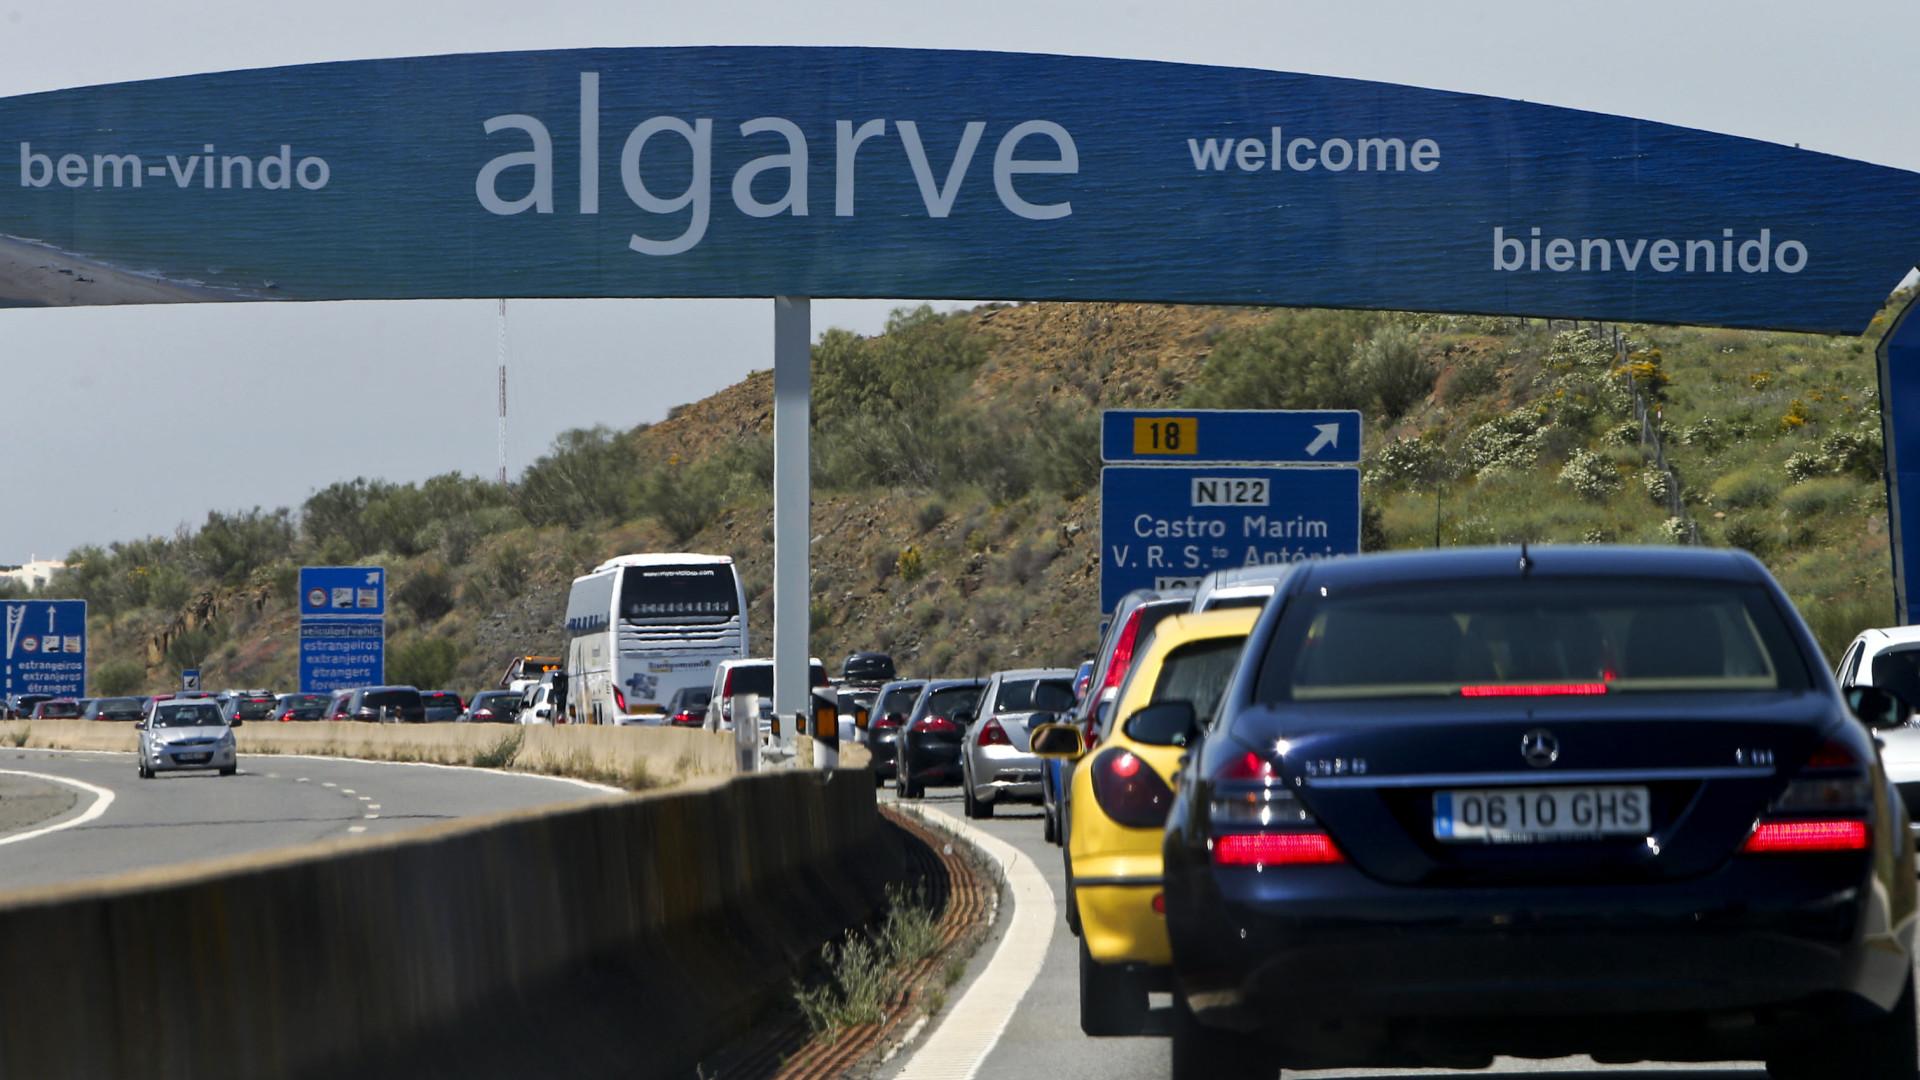 Via do Infante cortada entre Loulé e Faro devido a despiste. Há 3 feridos